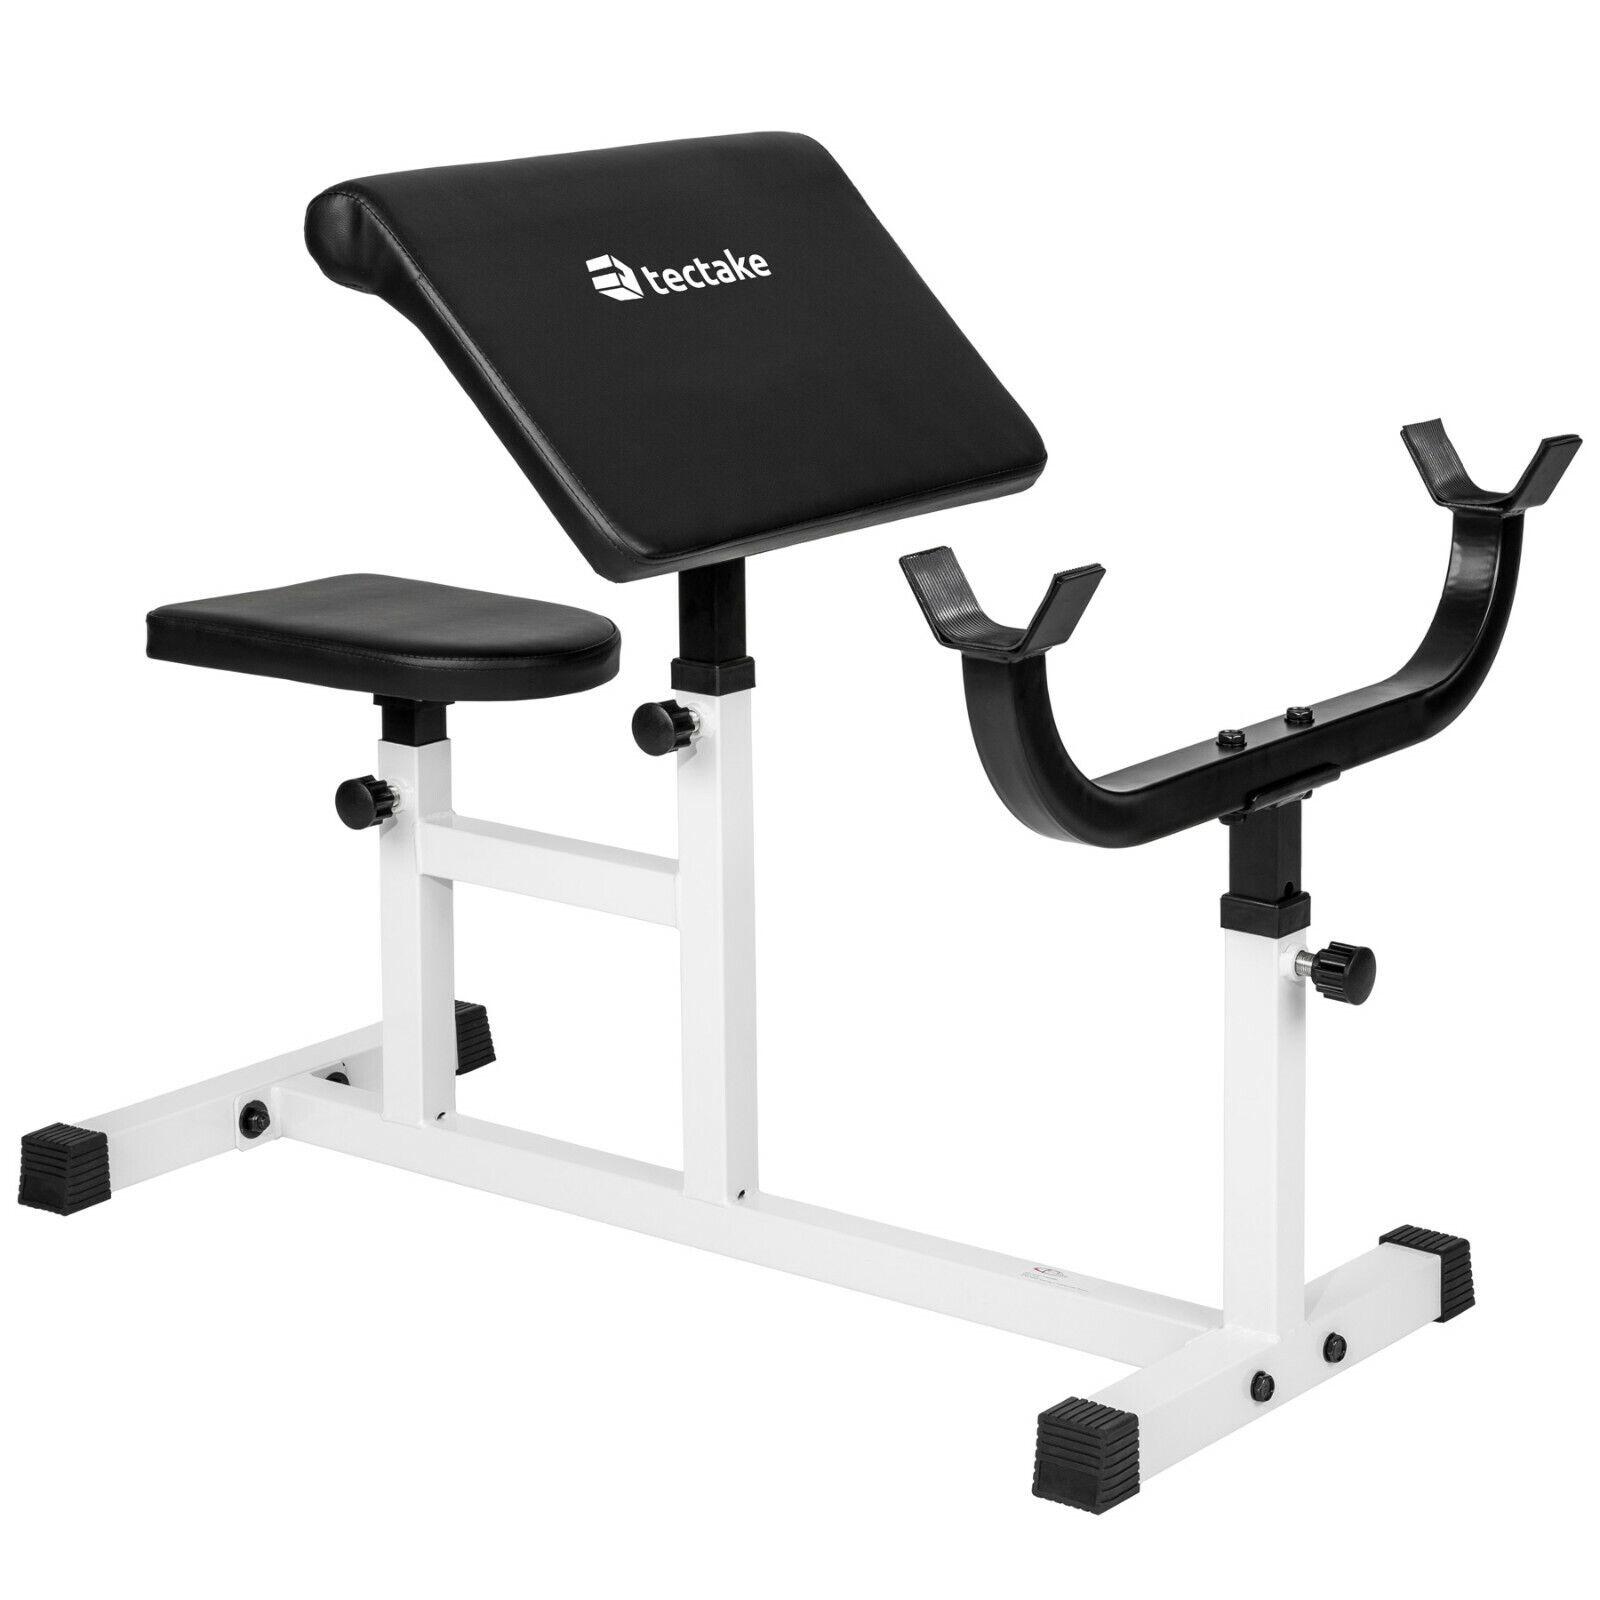 Proticatore curl panca allenaSieto panche regolabile sedia bicipite fitness